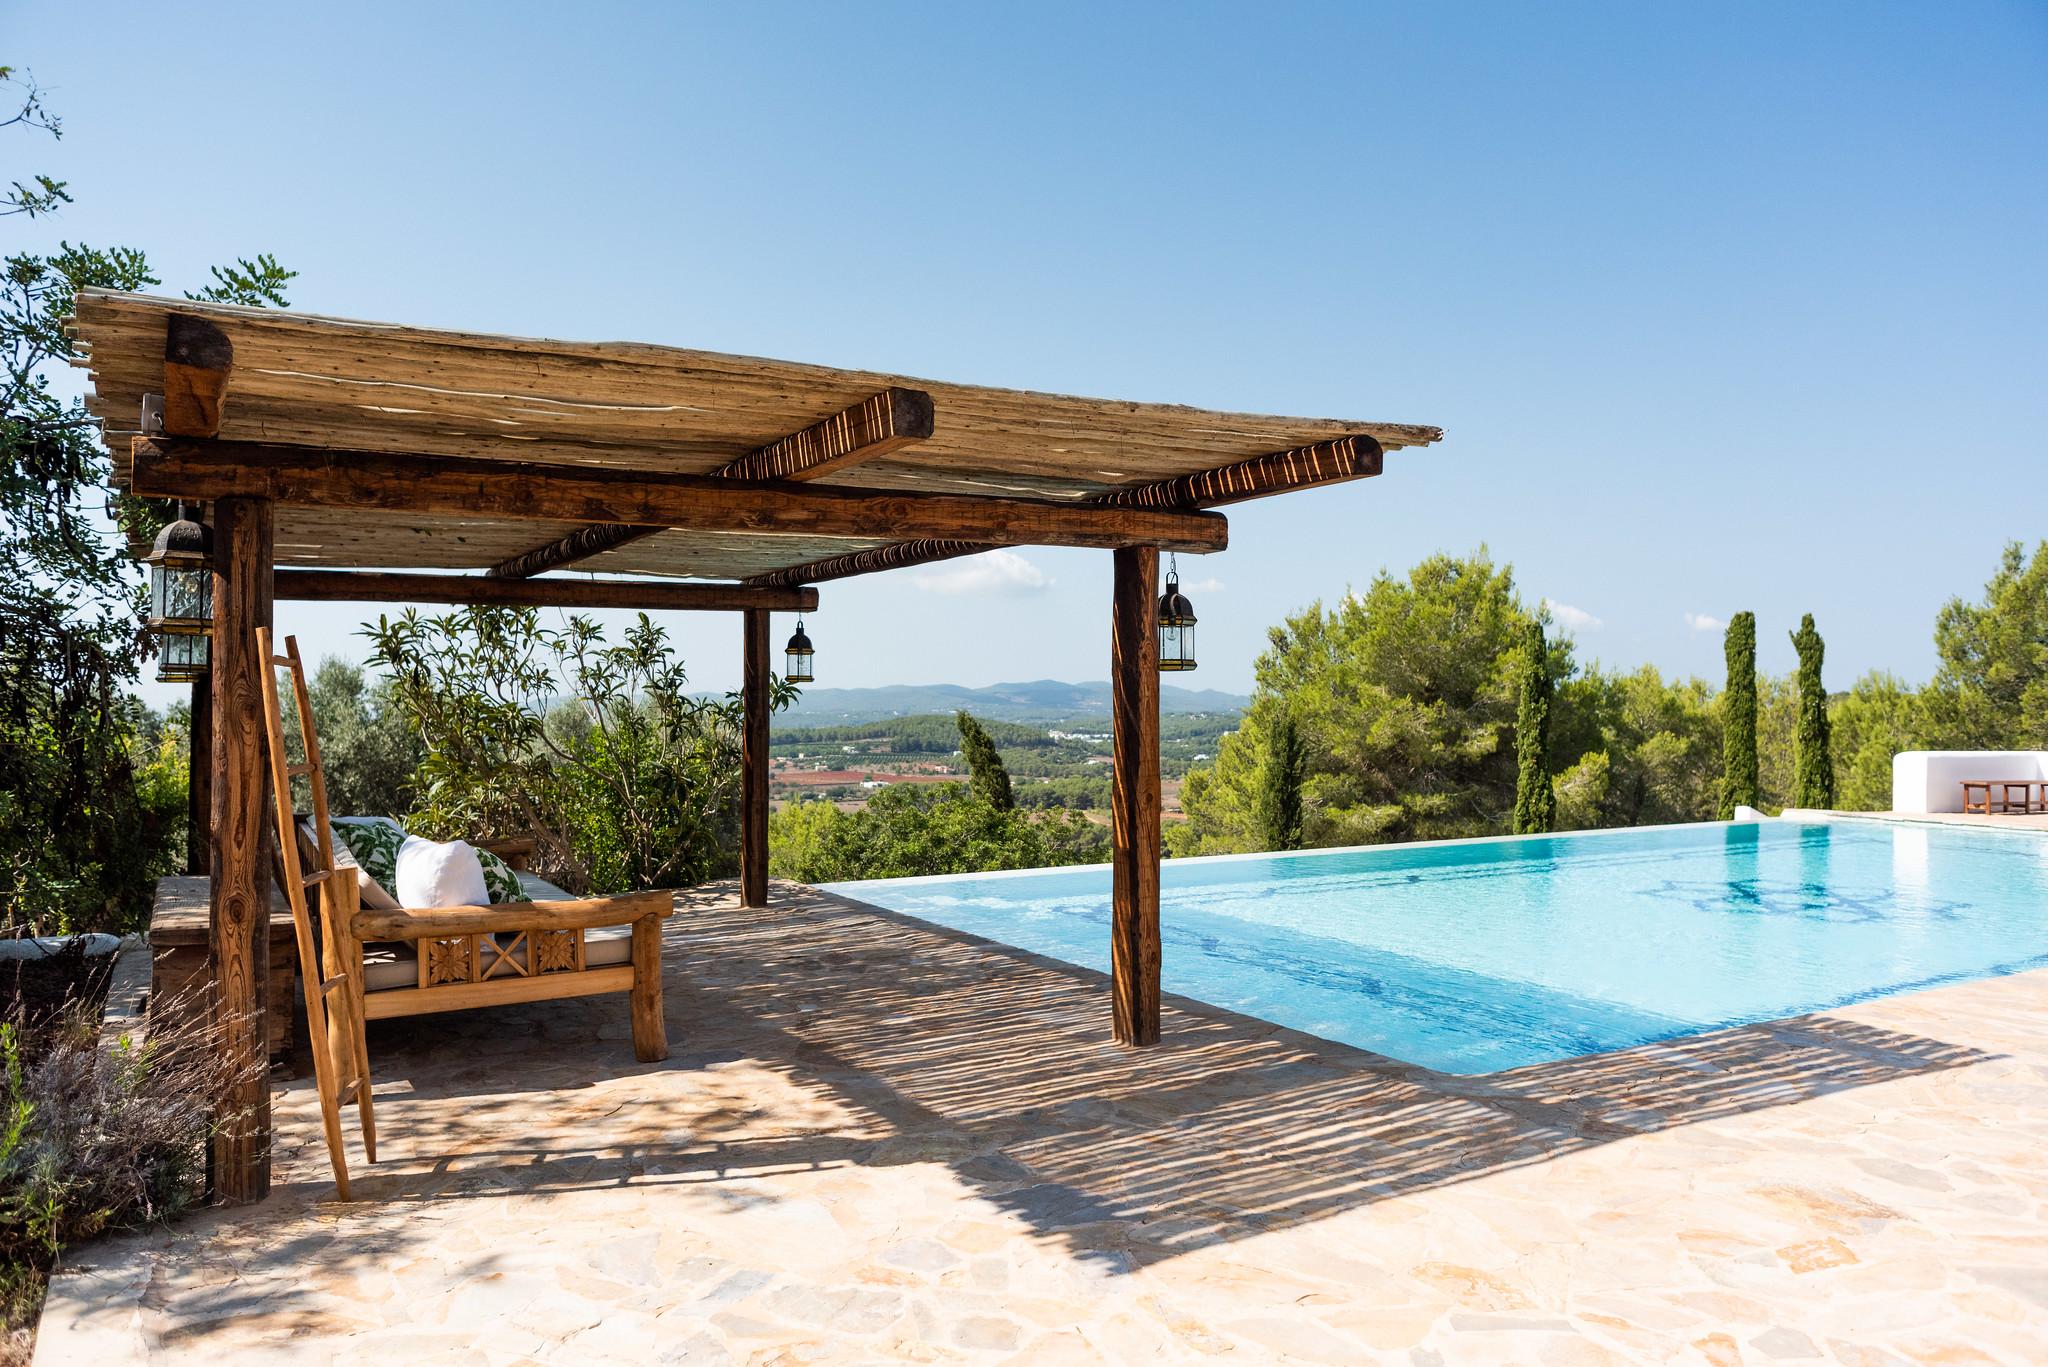 https://www.white-ibiza.com/wp-content/uploads/2020/05/white-ibiza-villas-can-lavanda-pool-side.jpg